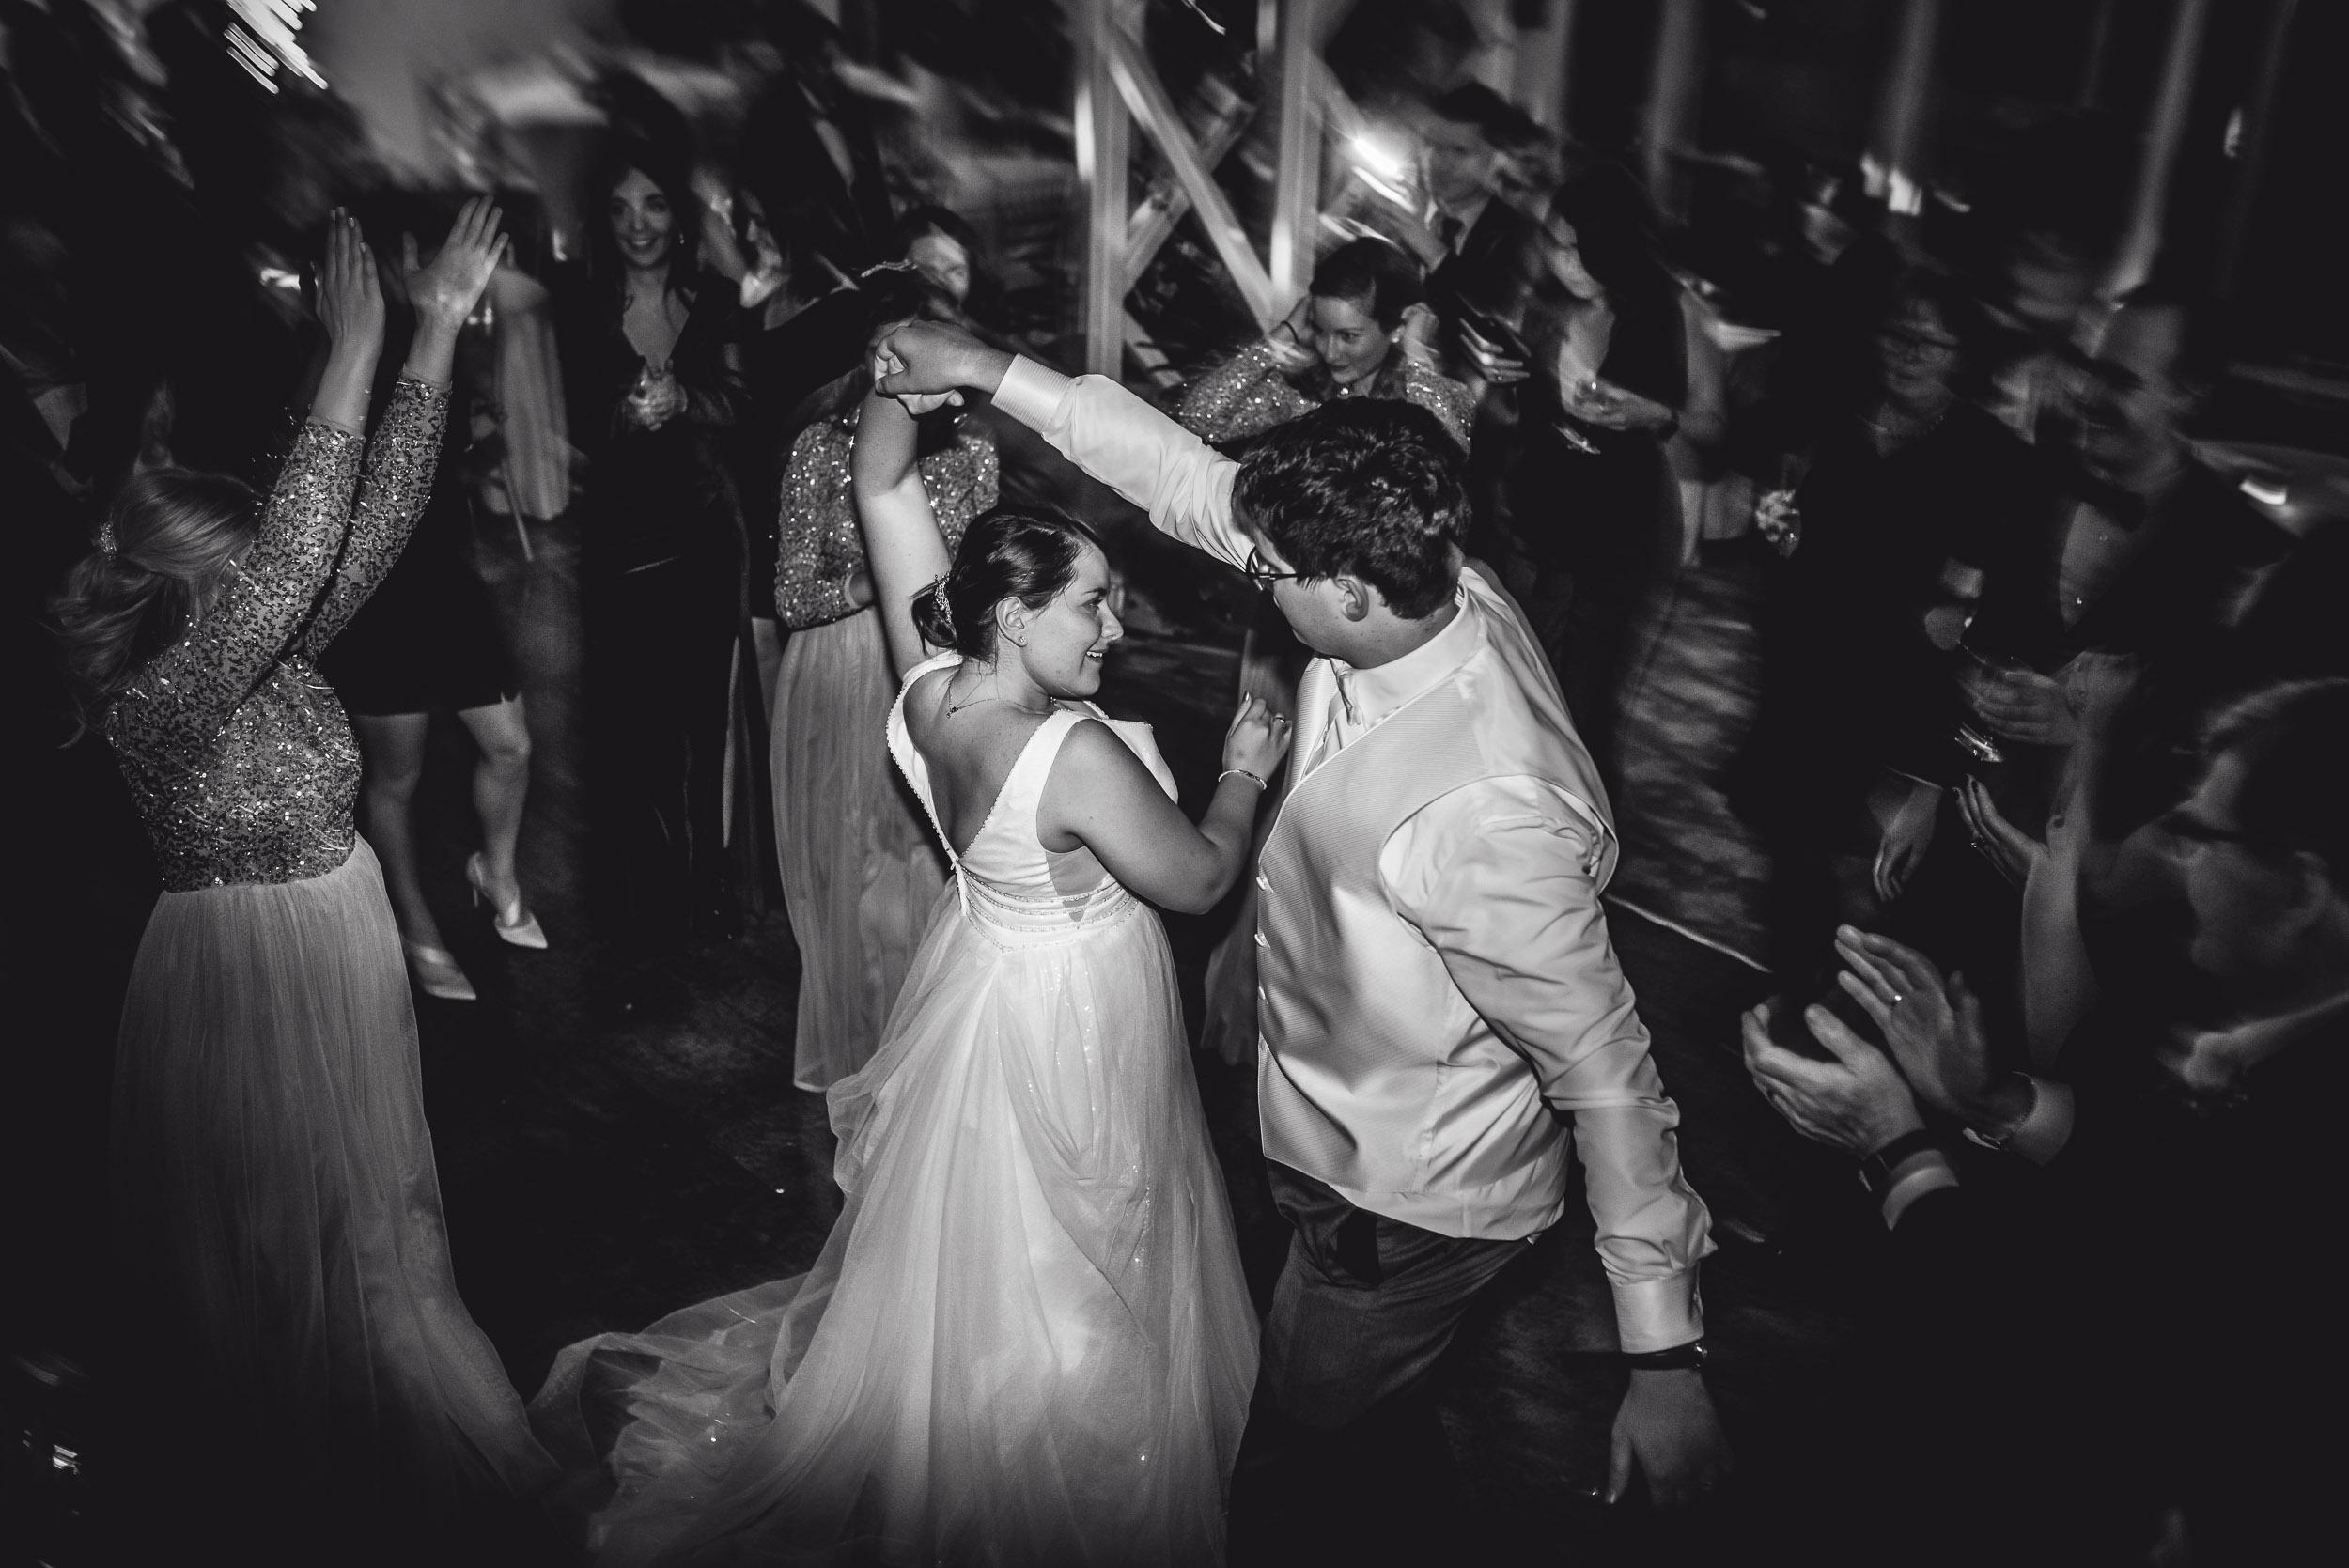 KatieandMathias_Morristown_NewJersey_Wedding_Church_Assumption_Madison_Hotel(63of65).jpg